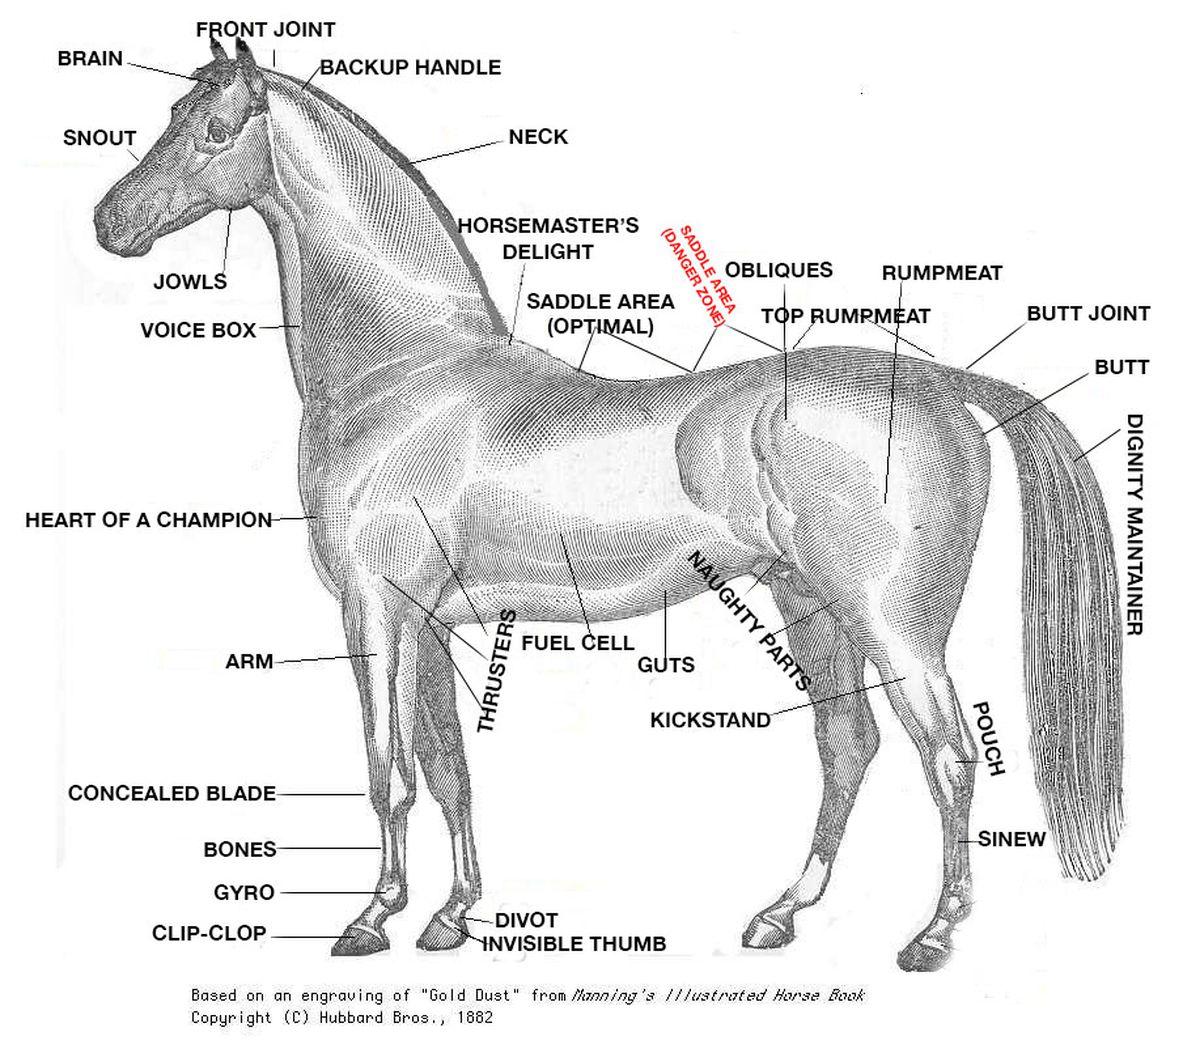 A Crash Course In Horse Anatomy For The Kentucky